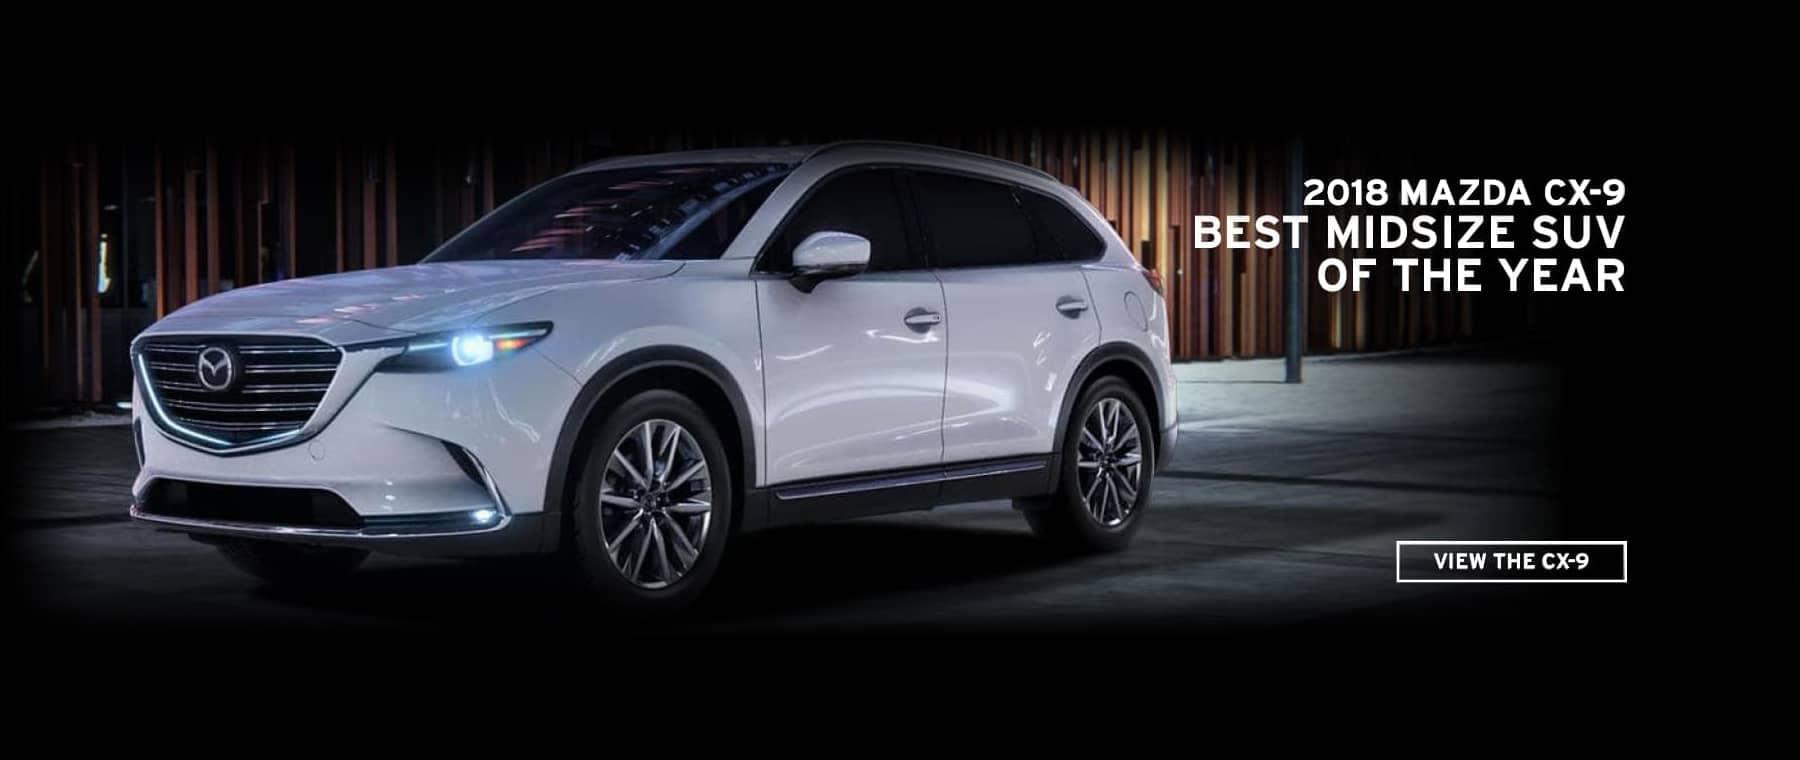 Mazda CX-9 Award